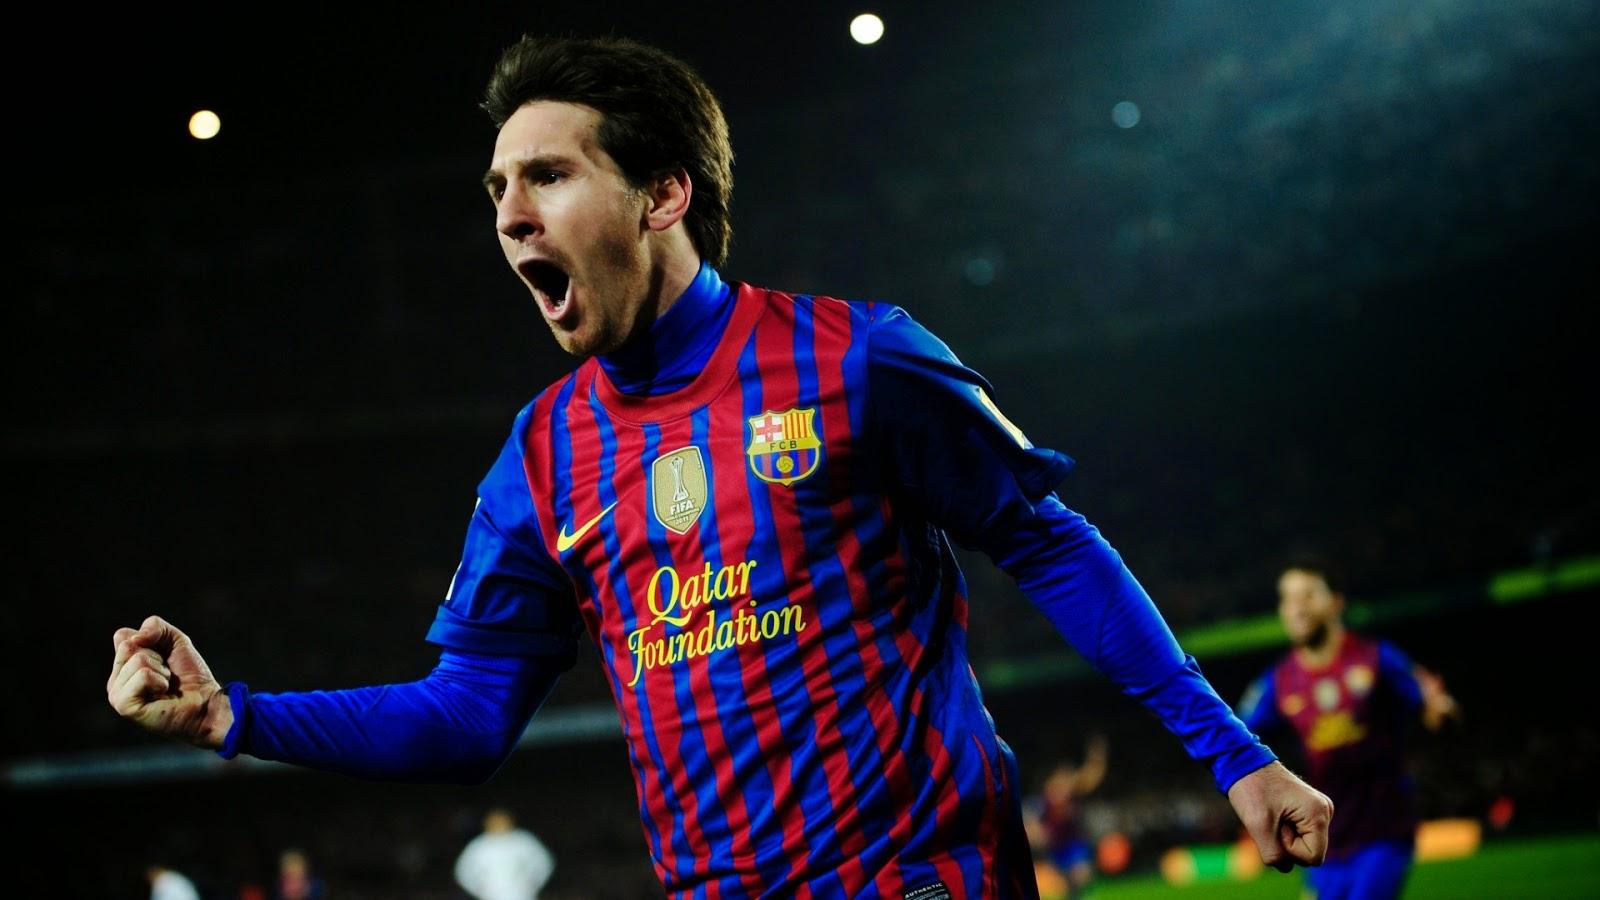 Lionel Messi Full HD Wallpapers 2016 Encarles Wallpaper 1600x900